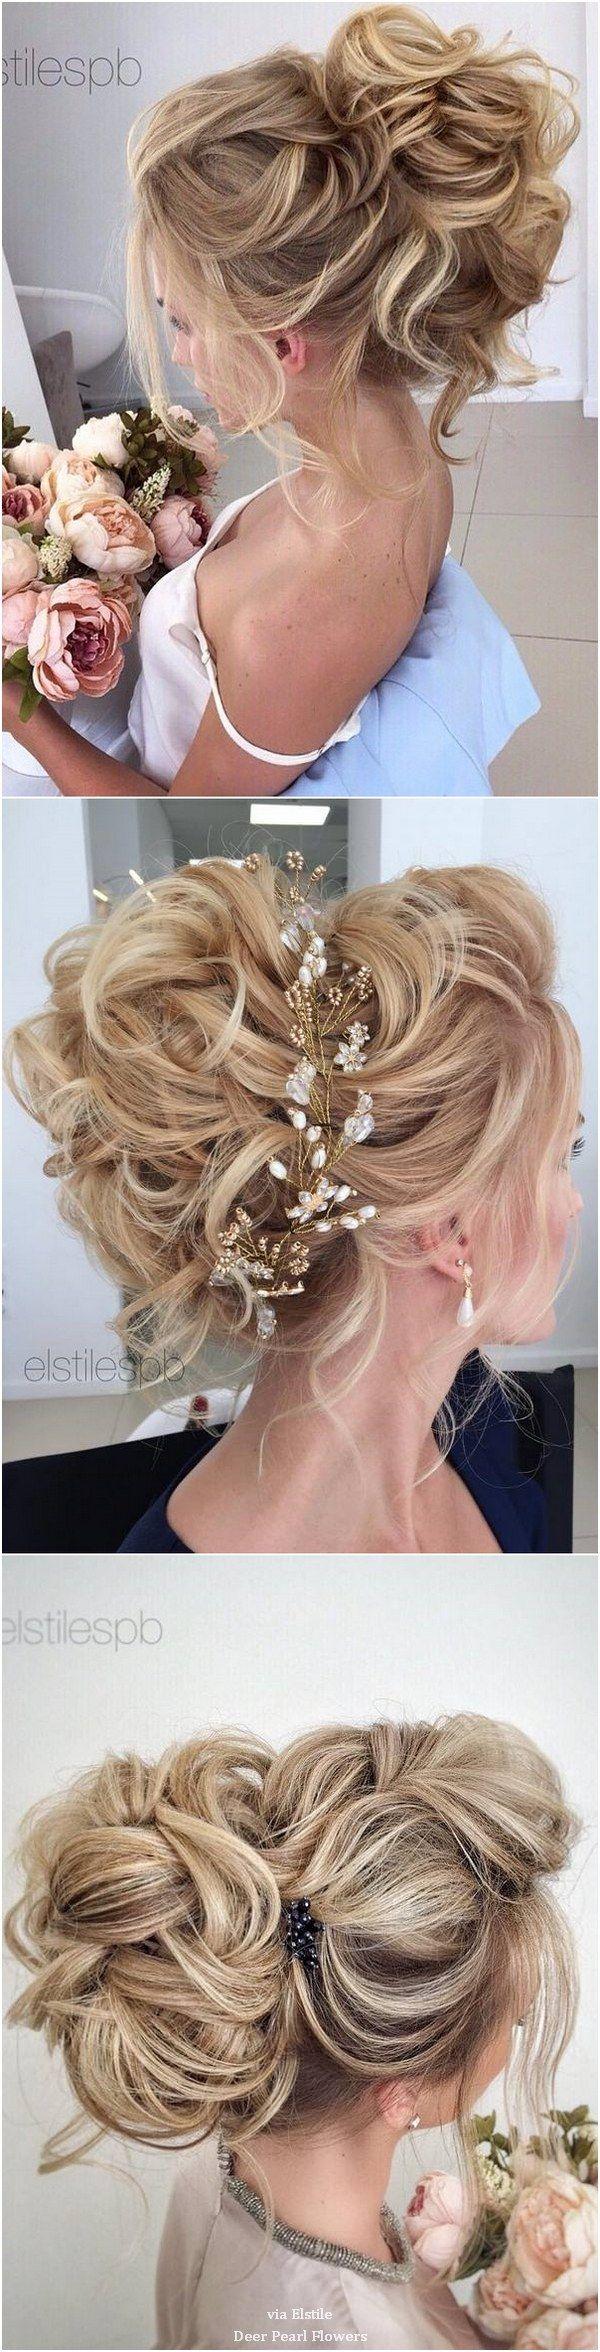 Elstile Long Wedding Hairstyle Inspiration / www.deerpearlflow...